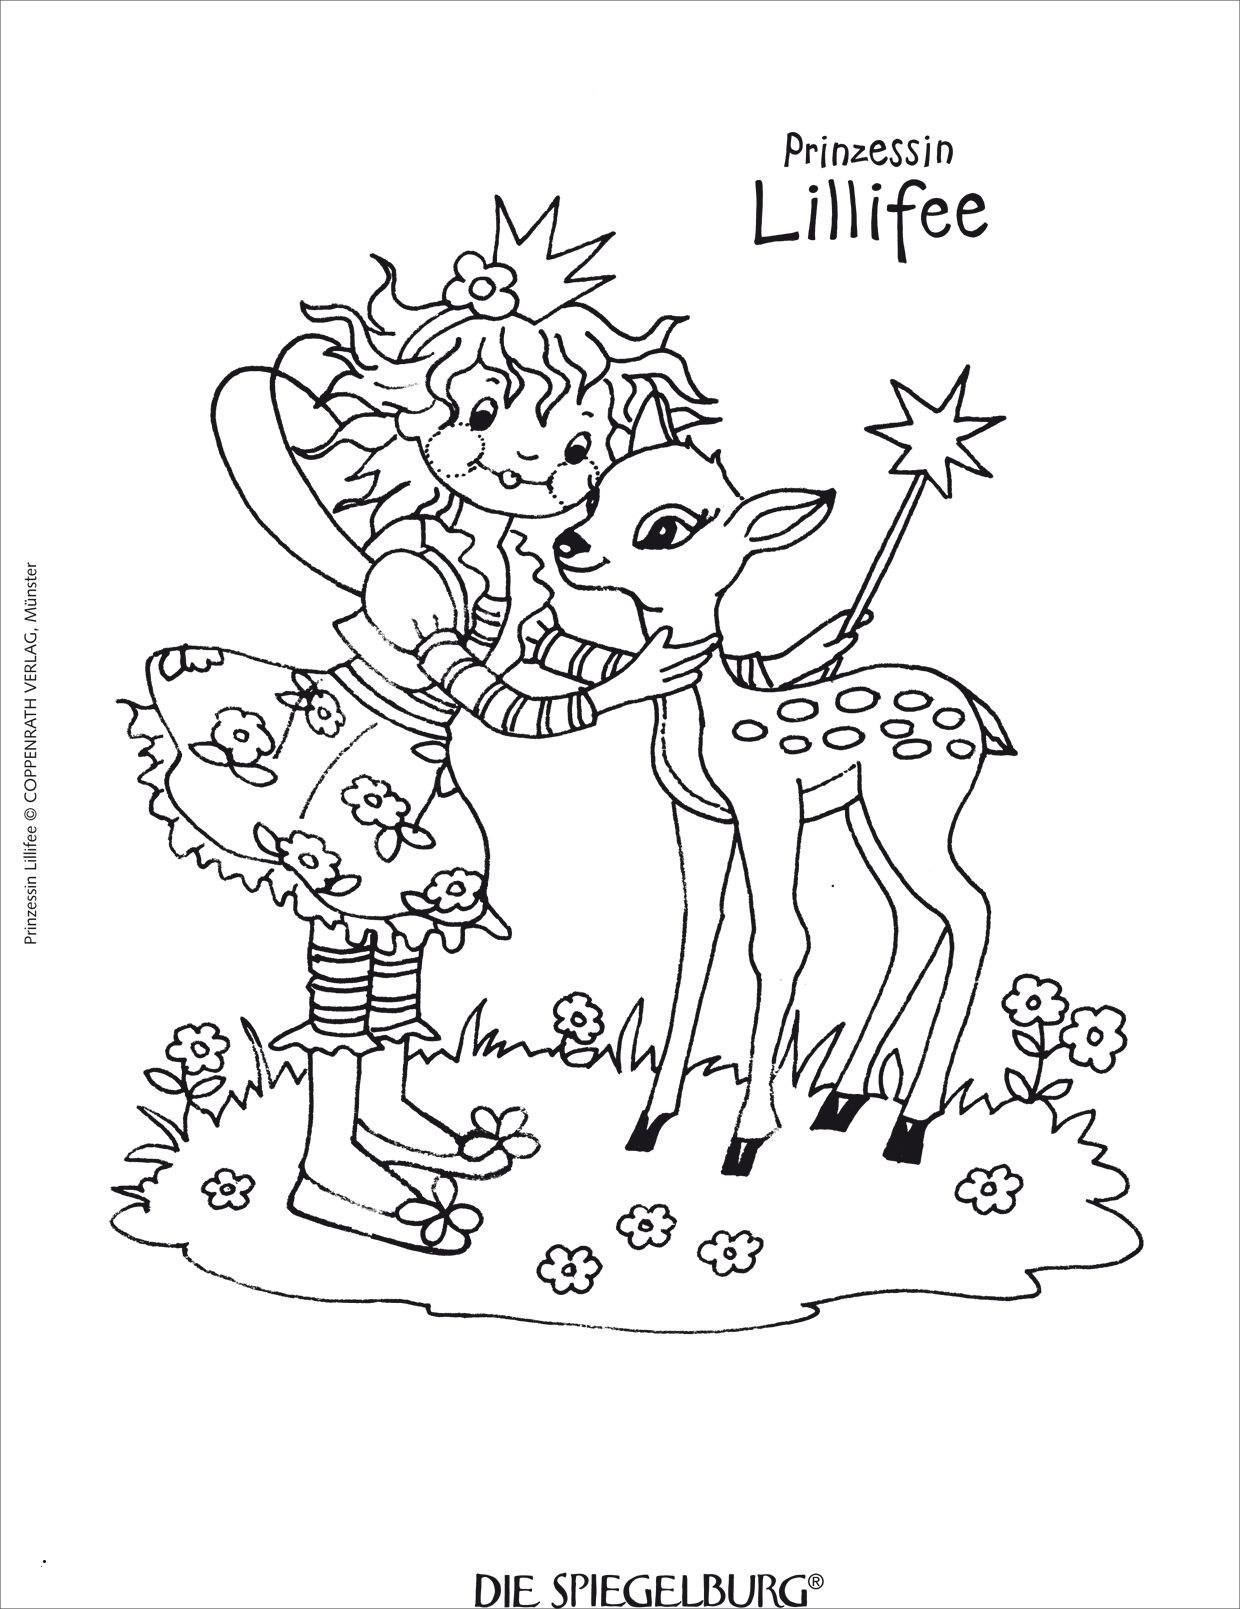 Ausmalbild Prinzessin Einhorn Genial 52 Idee Malvorlagen Prinzessin Lillifee Treehouse Nyc Stock